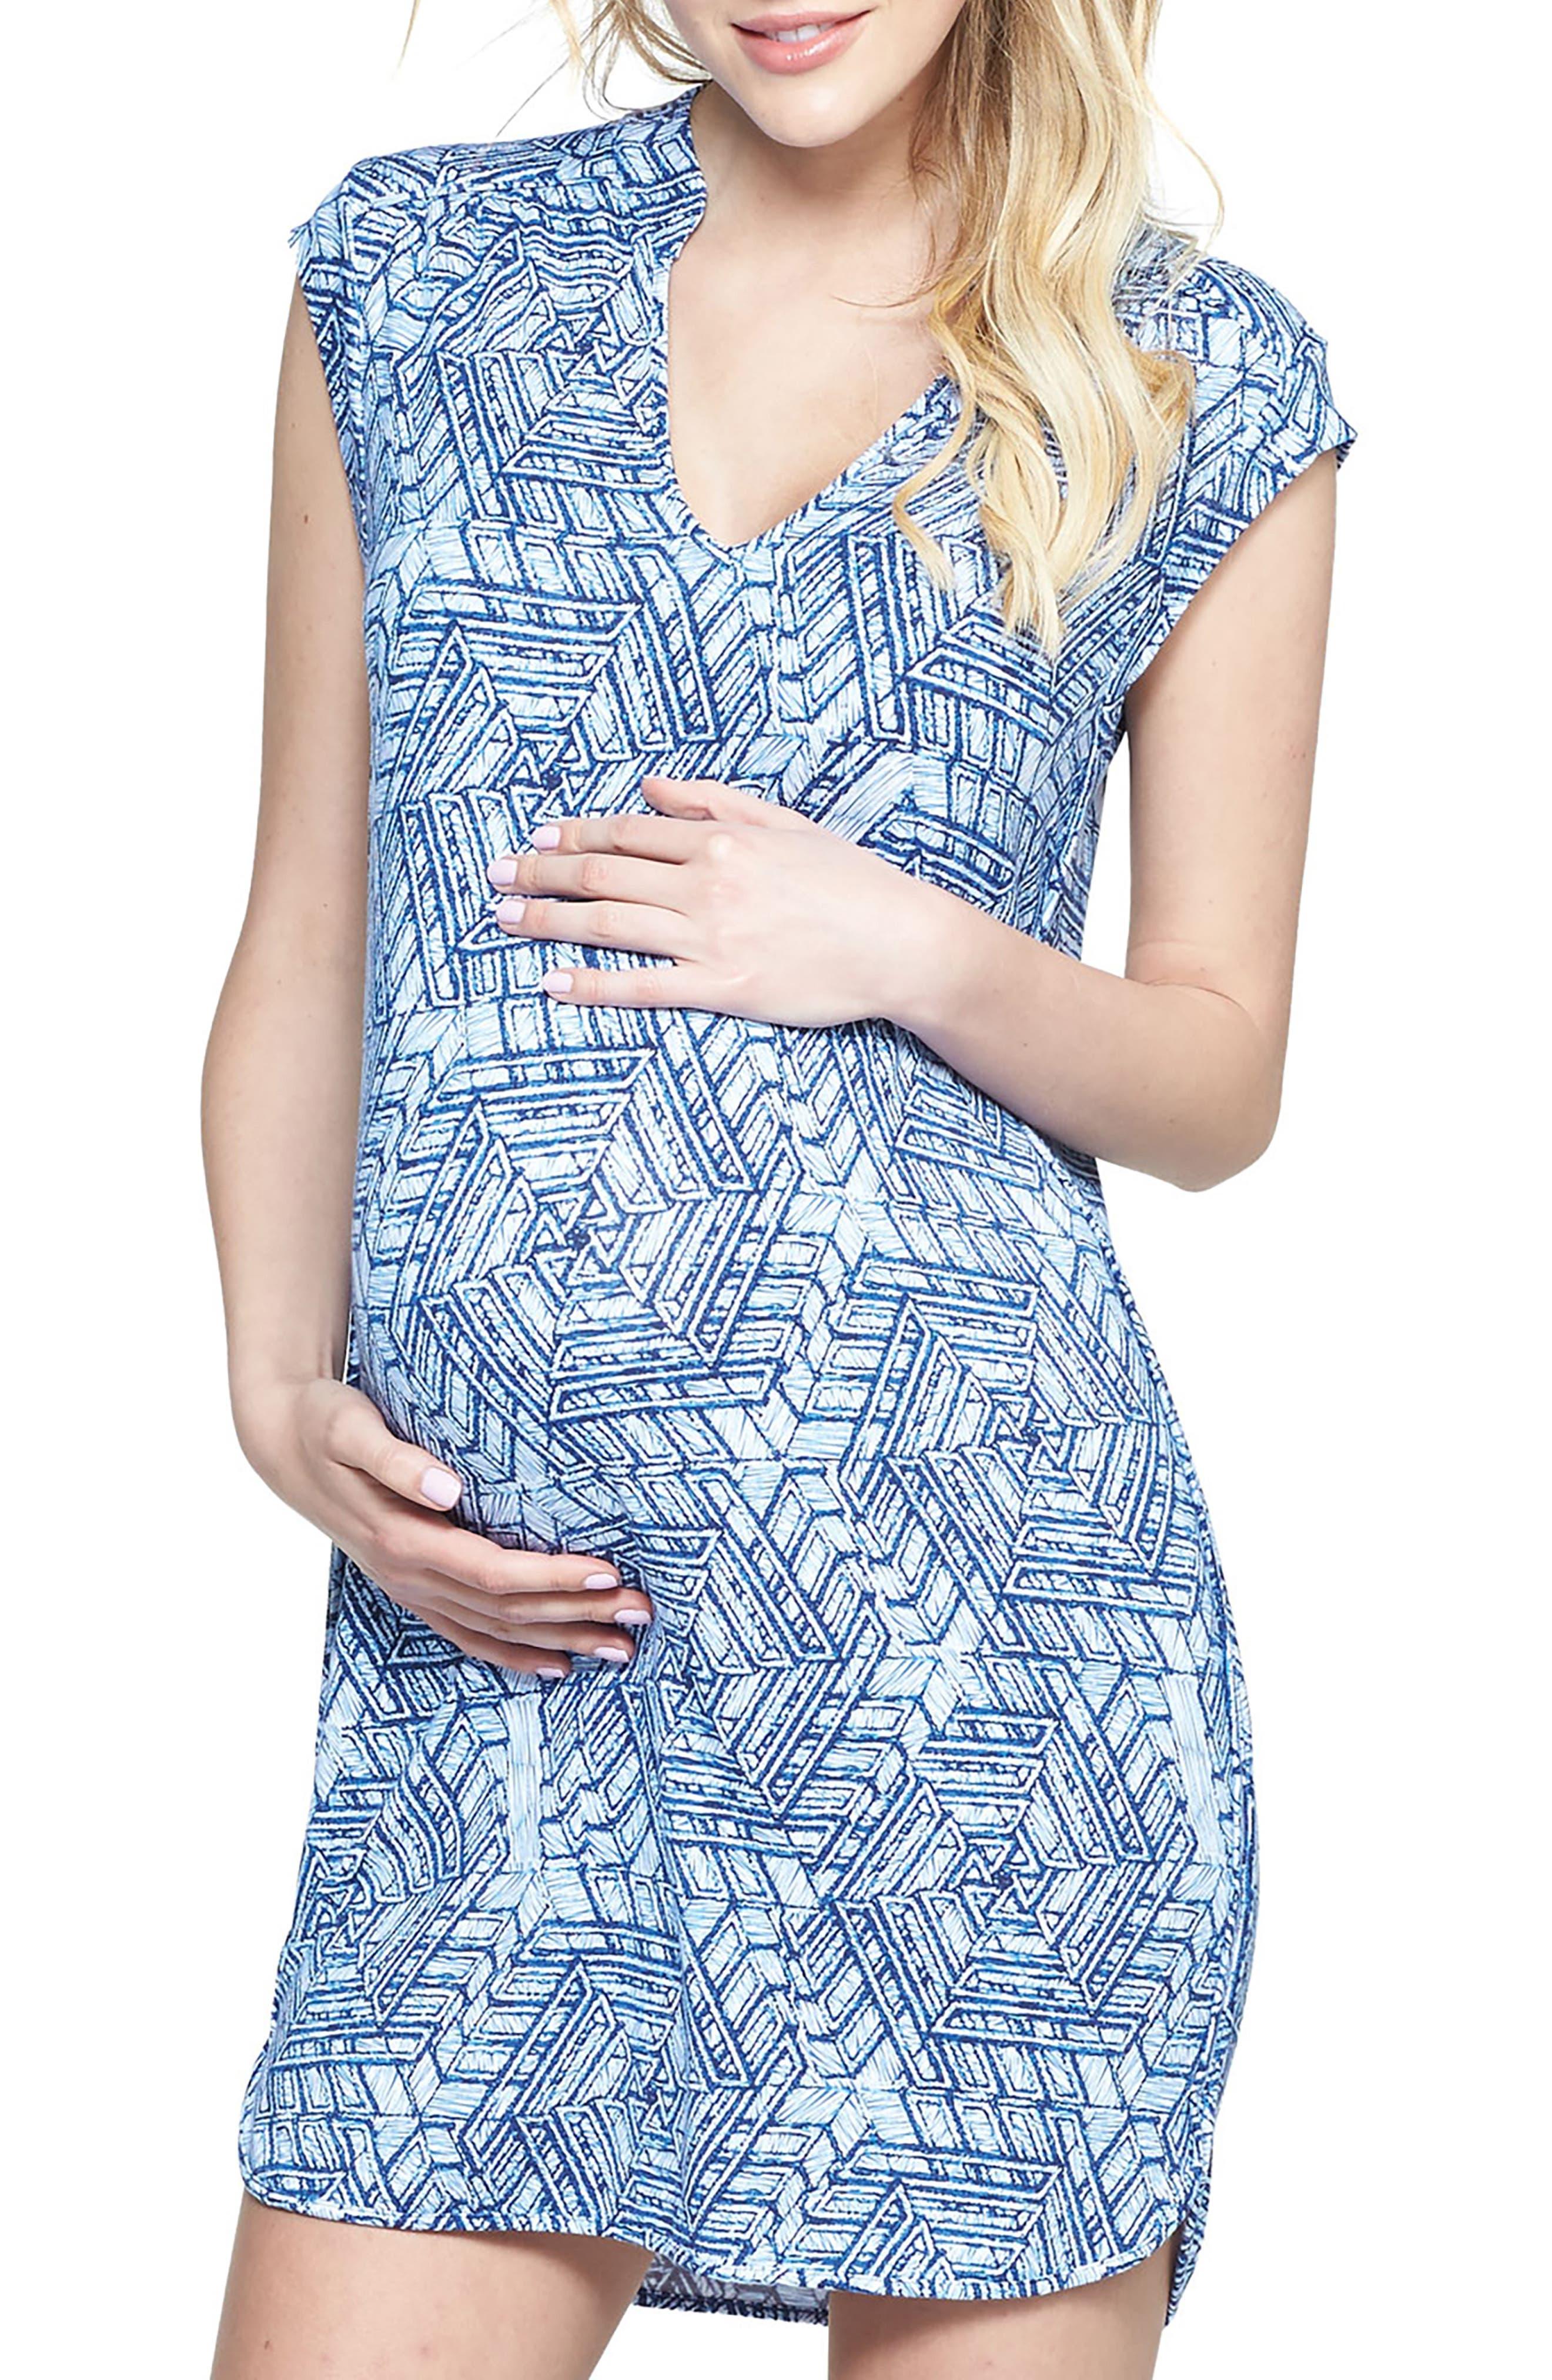 TART MATERNITY 'Mellie' Embellished Neck Maternity Dress, Main, color, SCRIBBLE GEO